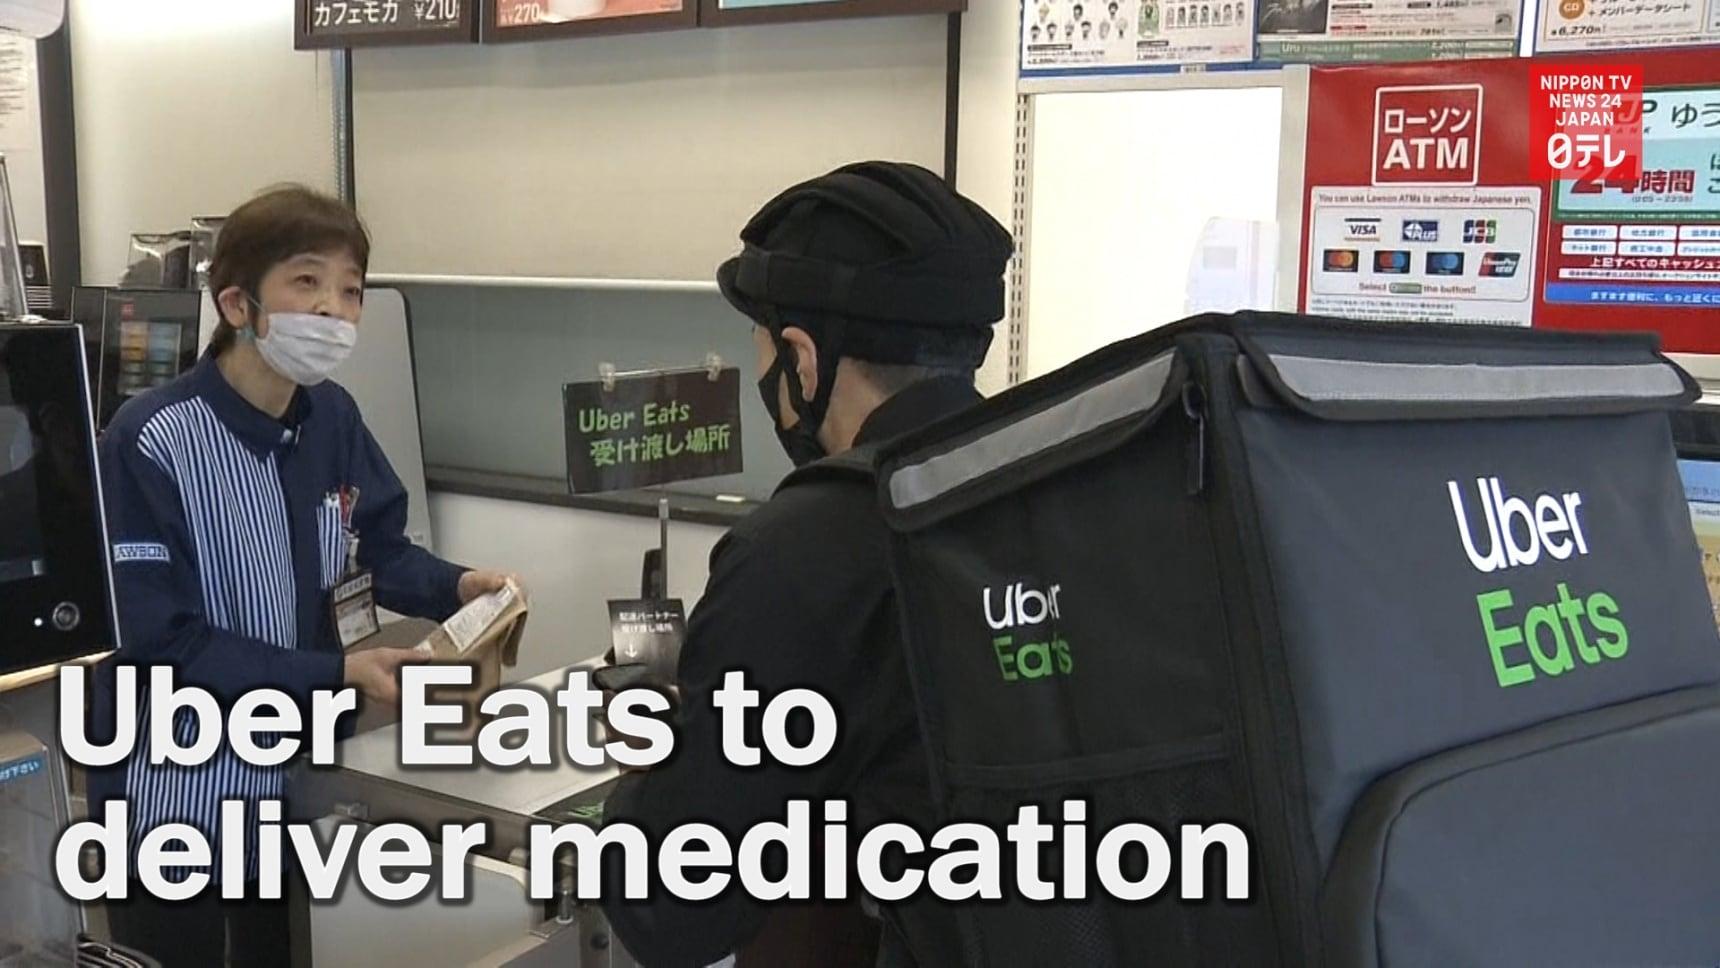 Uber Eats Starts Medication Delivery Trials